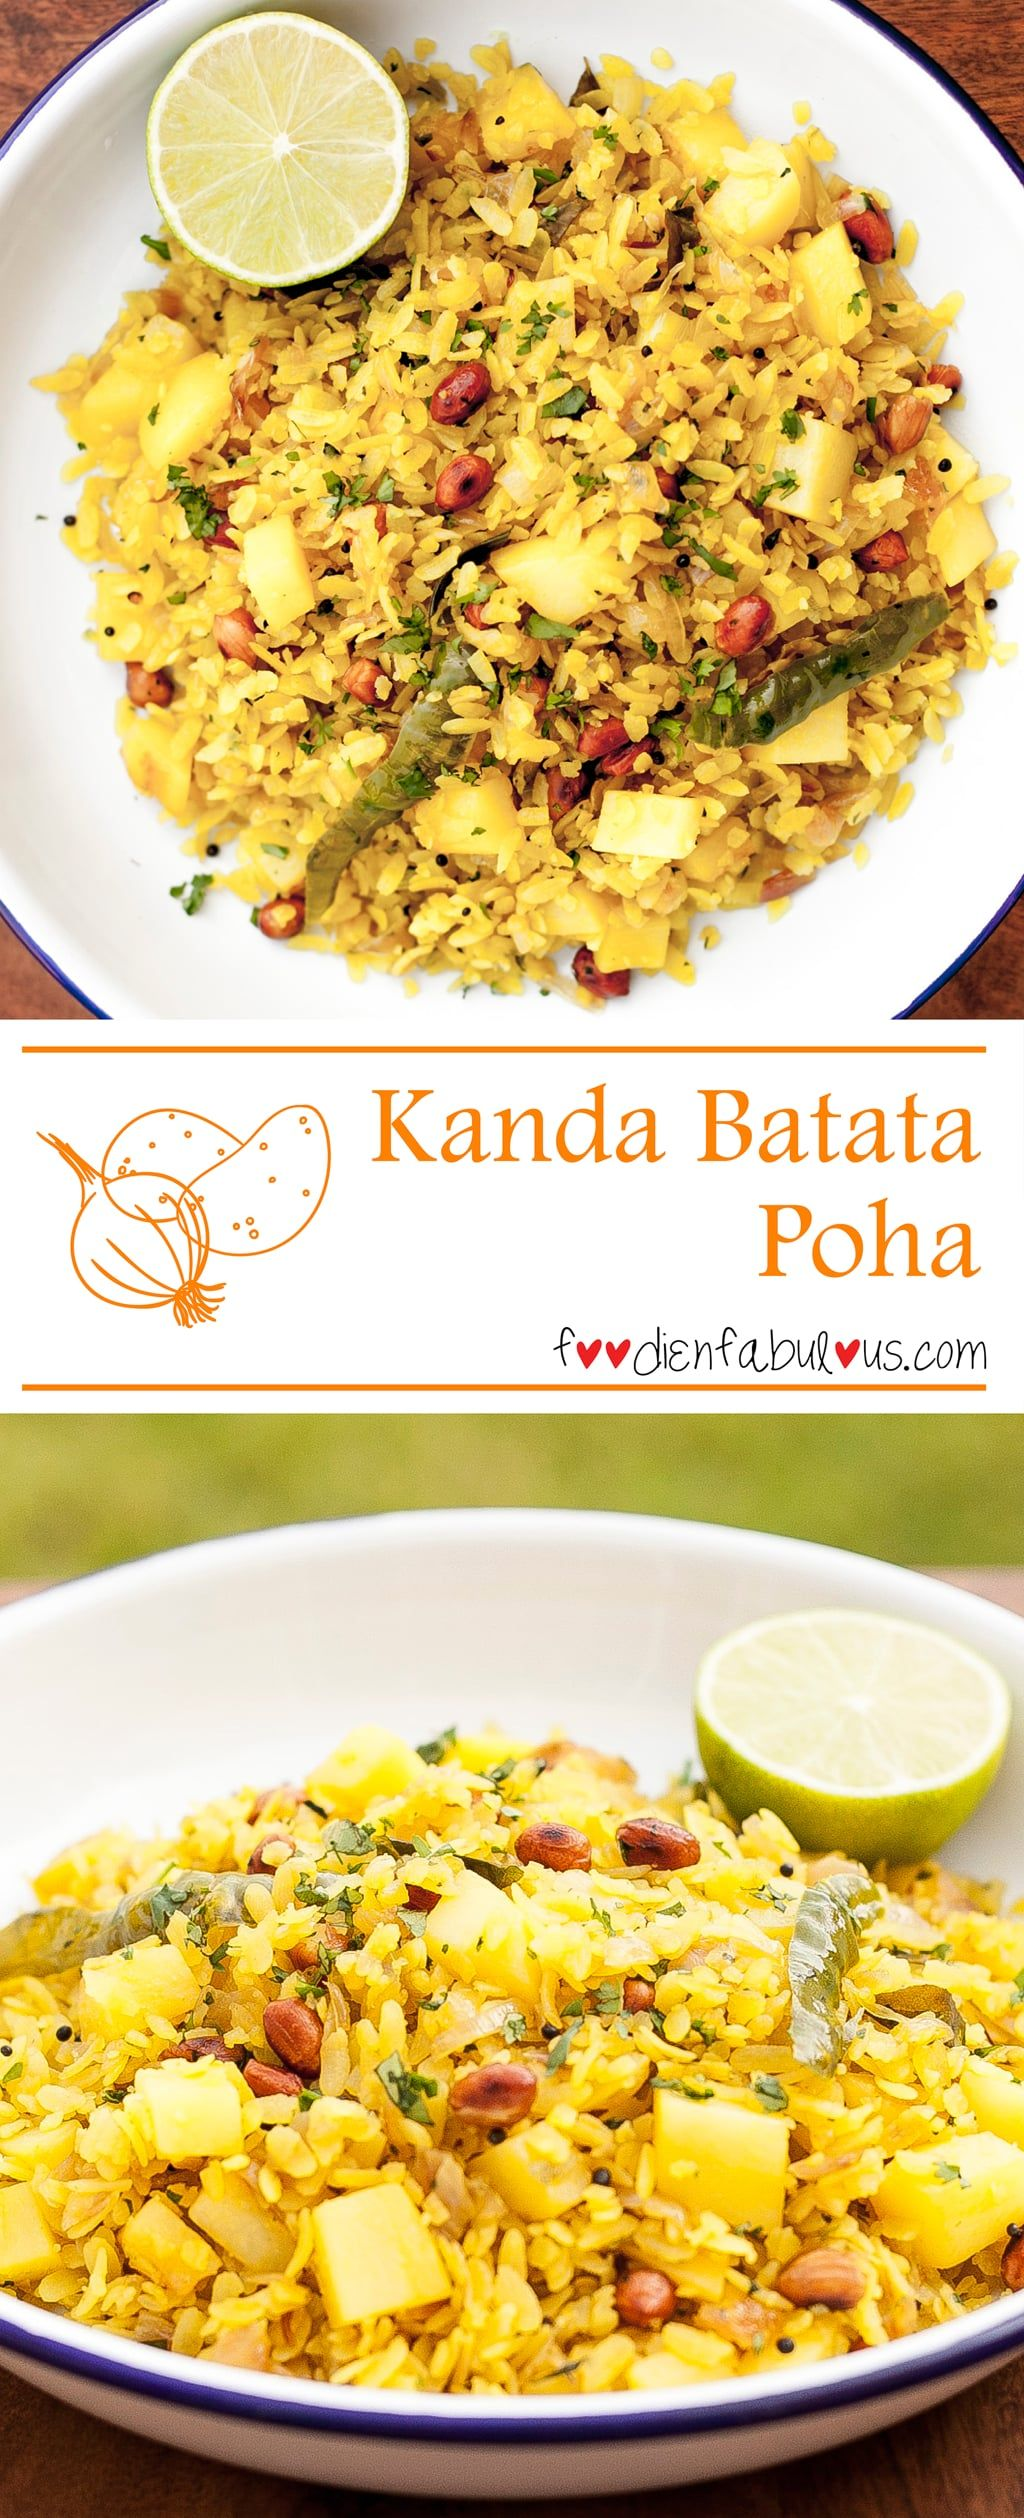 Kanda Batata Poha Recipe Foodienfabulous Recipes Recipes